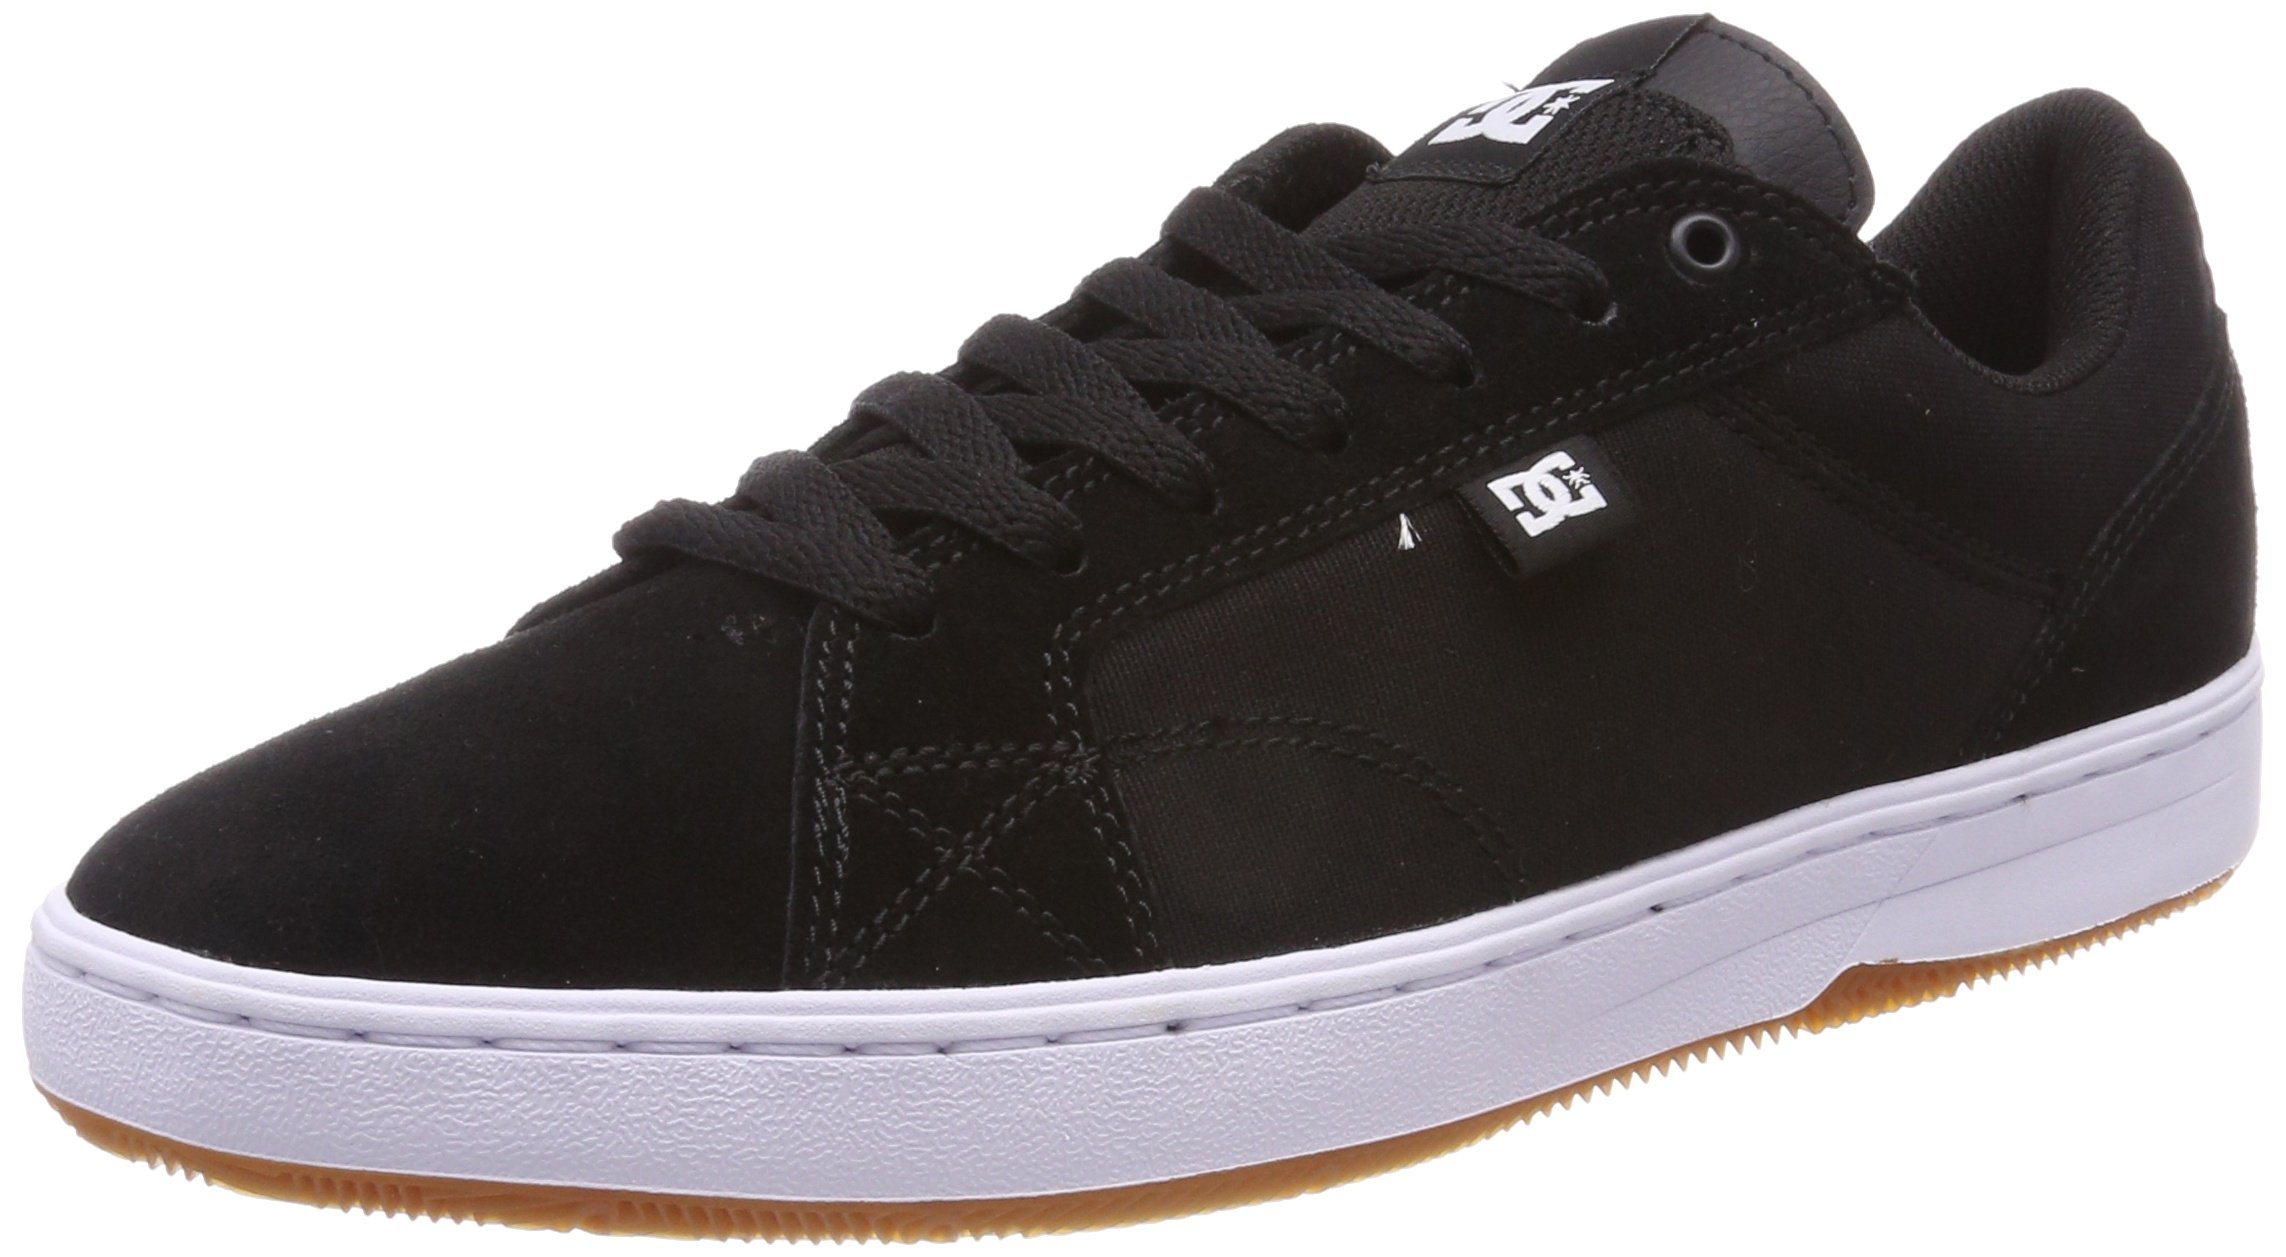 Eu AstorBaskets Bw644 Dc white Shoes gum HommeNoirblack bgv7Yf6y